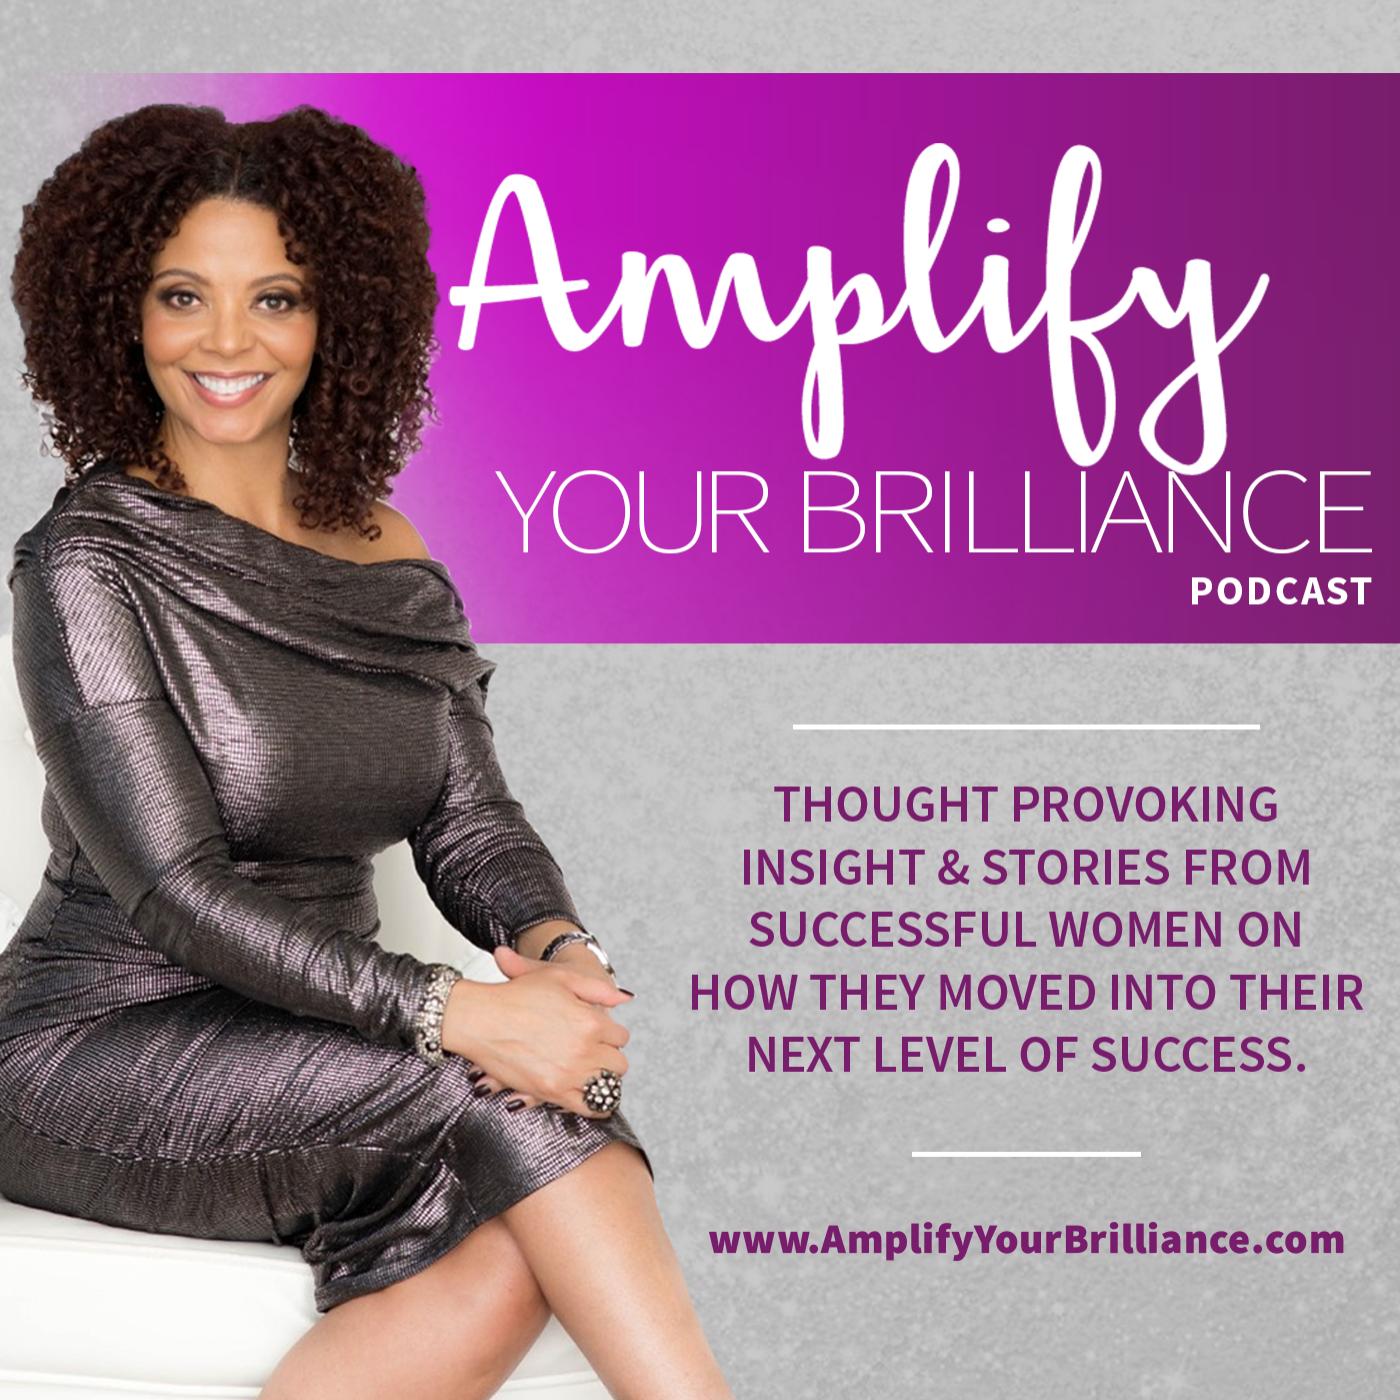 Amplify Your Brilliance show art